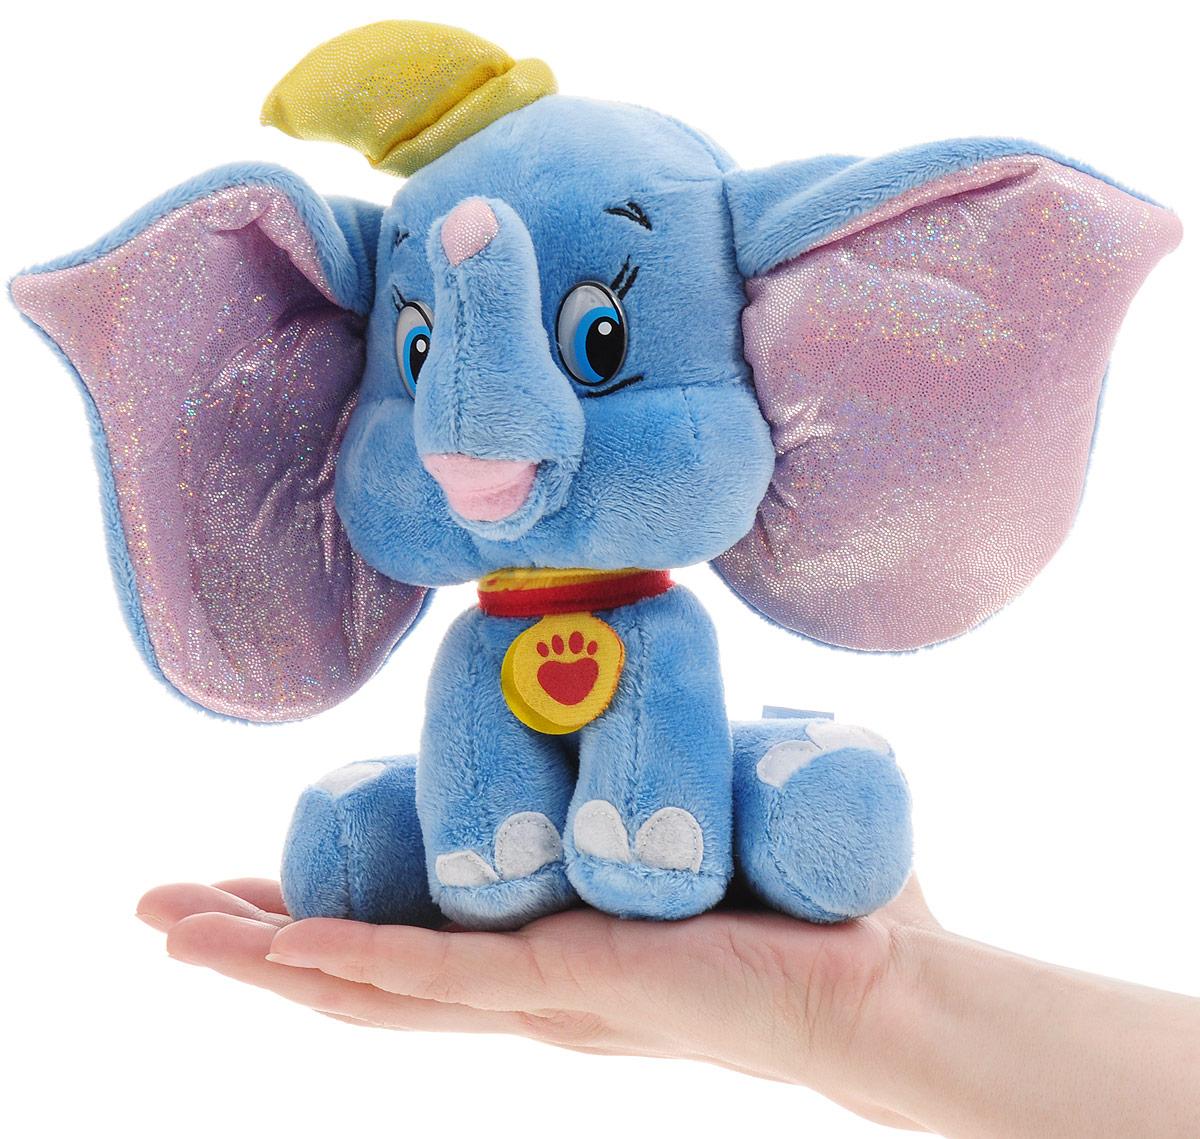 Картинки игрушек слоненок втираем грудку